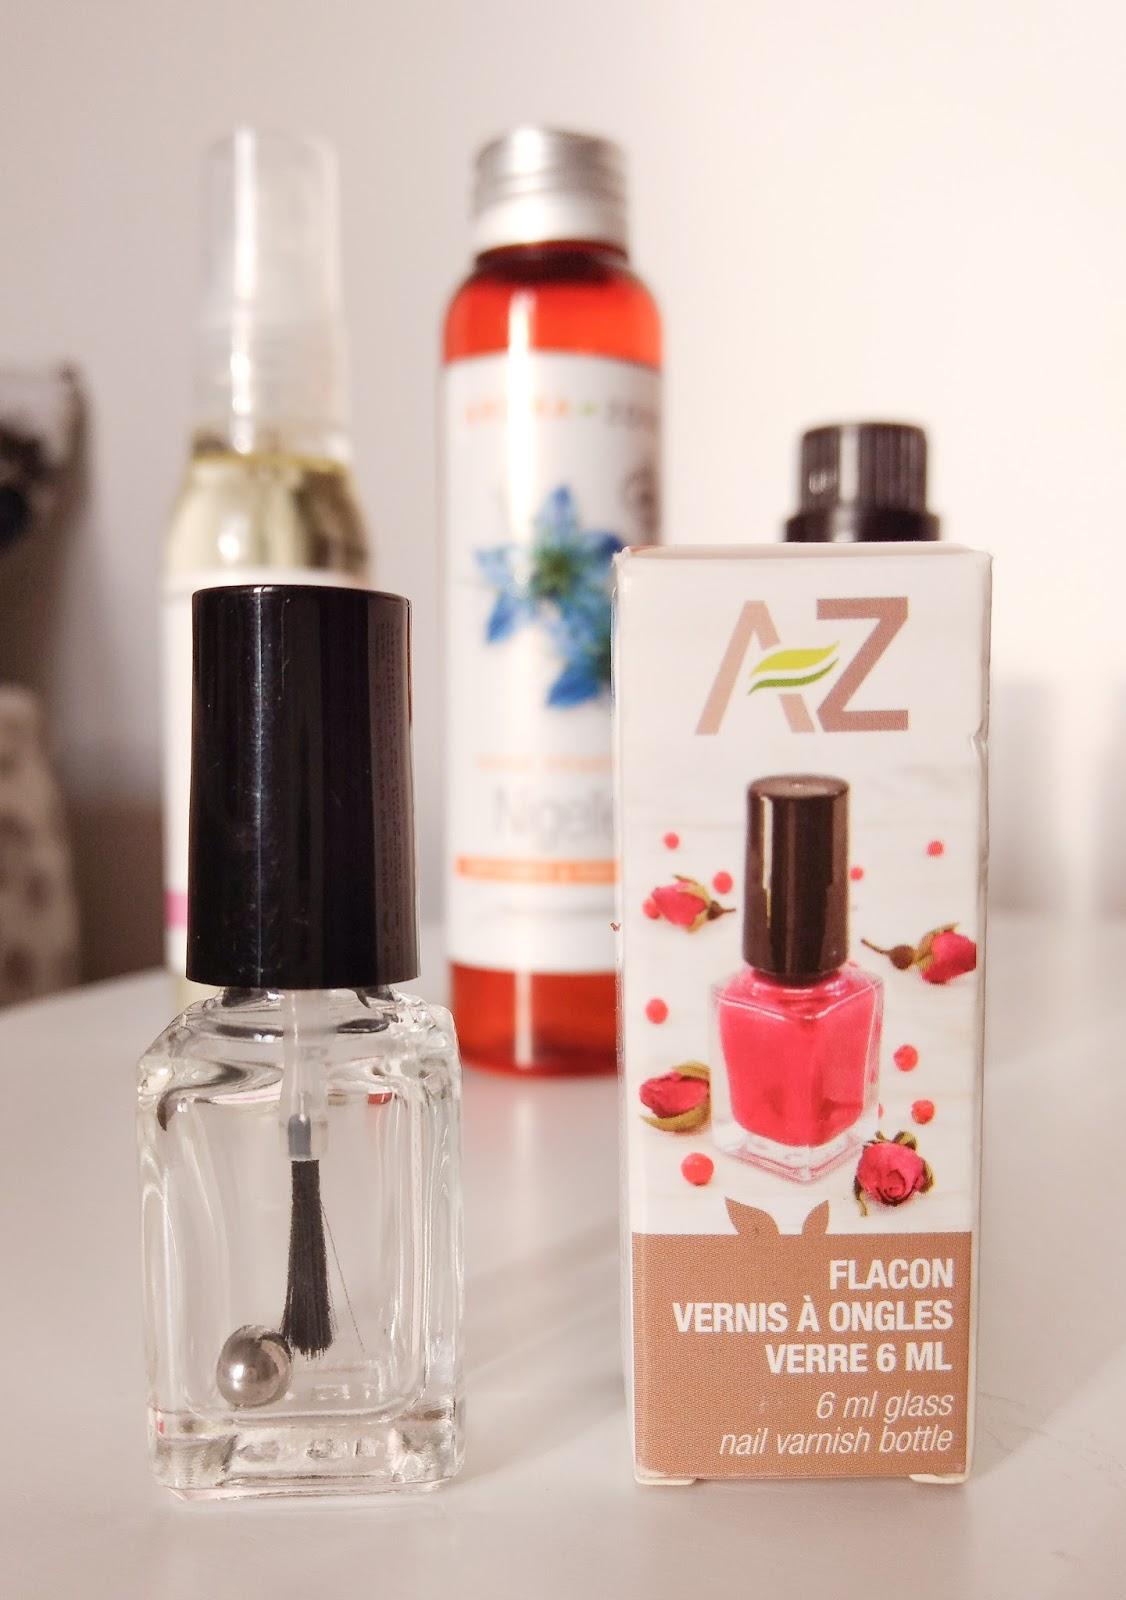 flacon-vernis-vide-aromazone